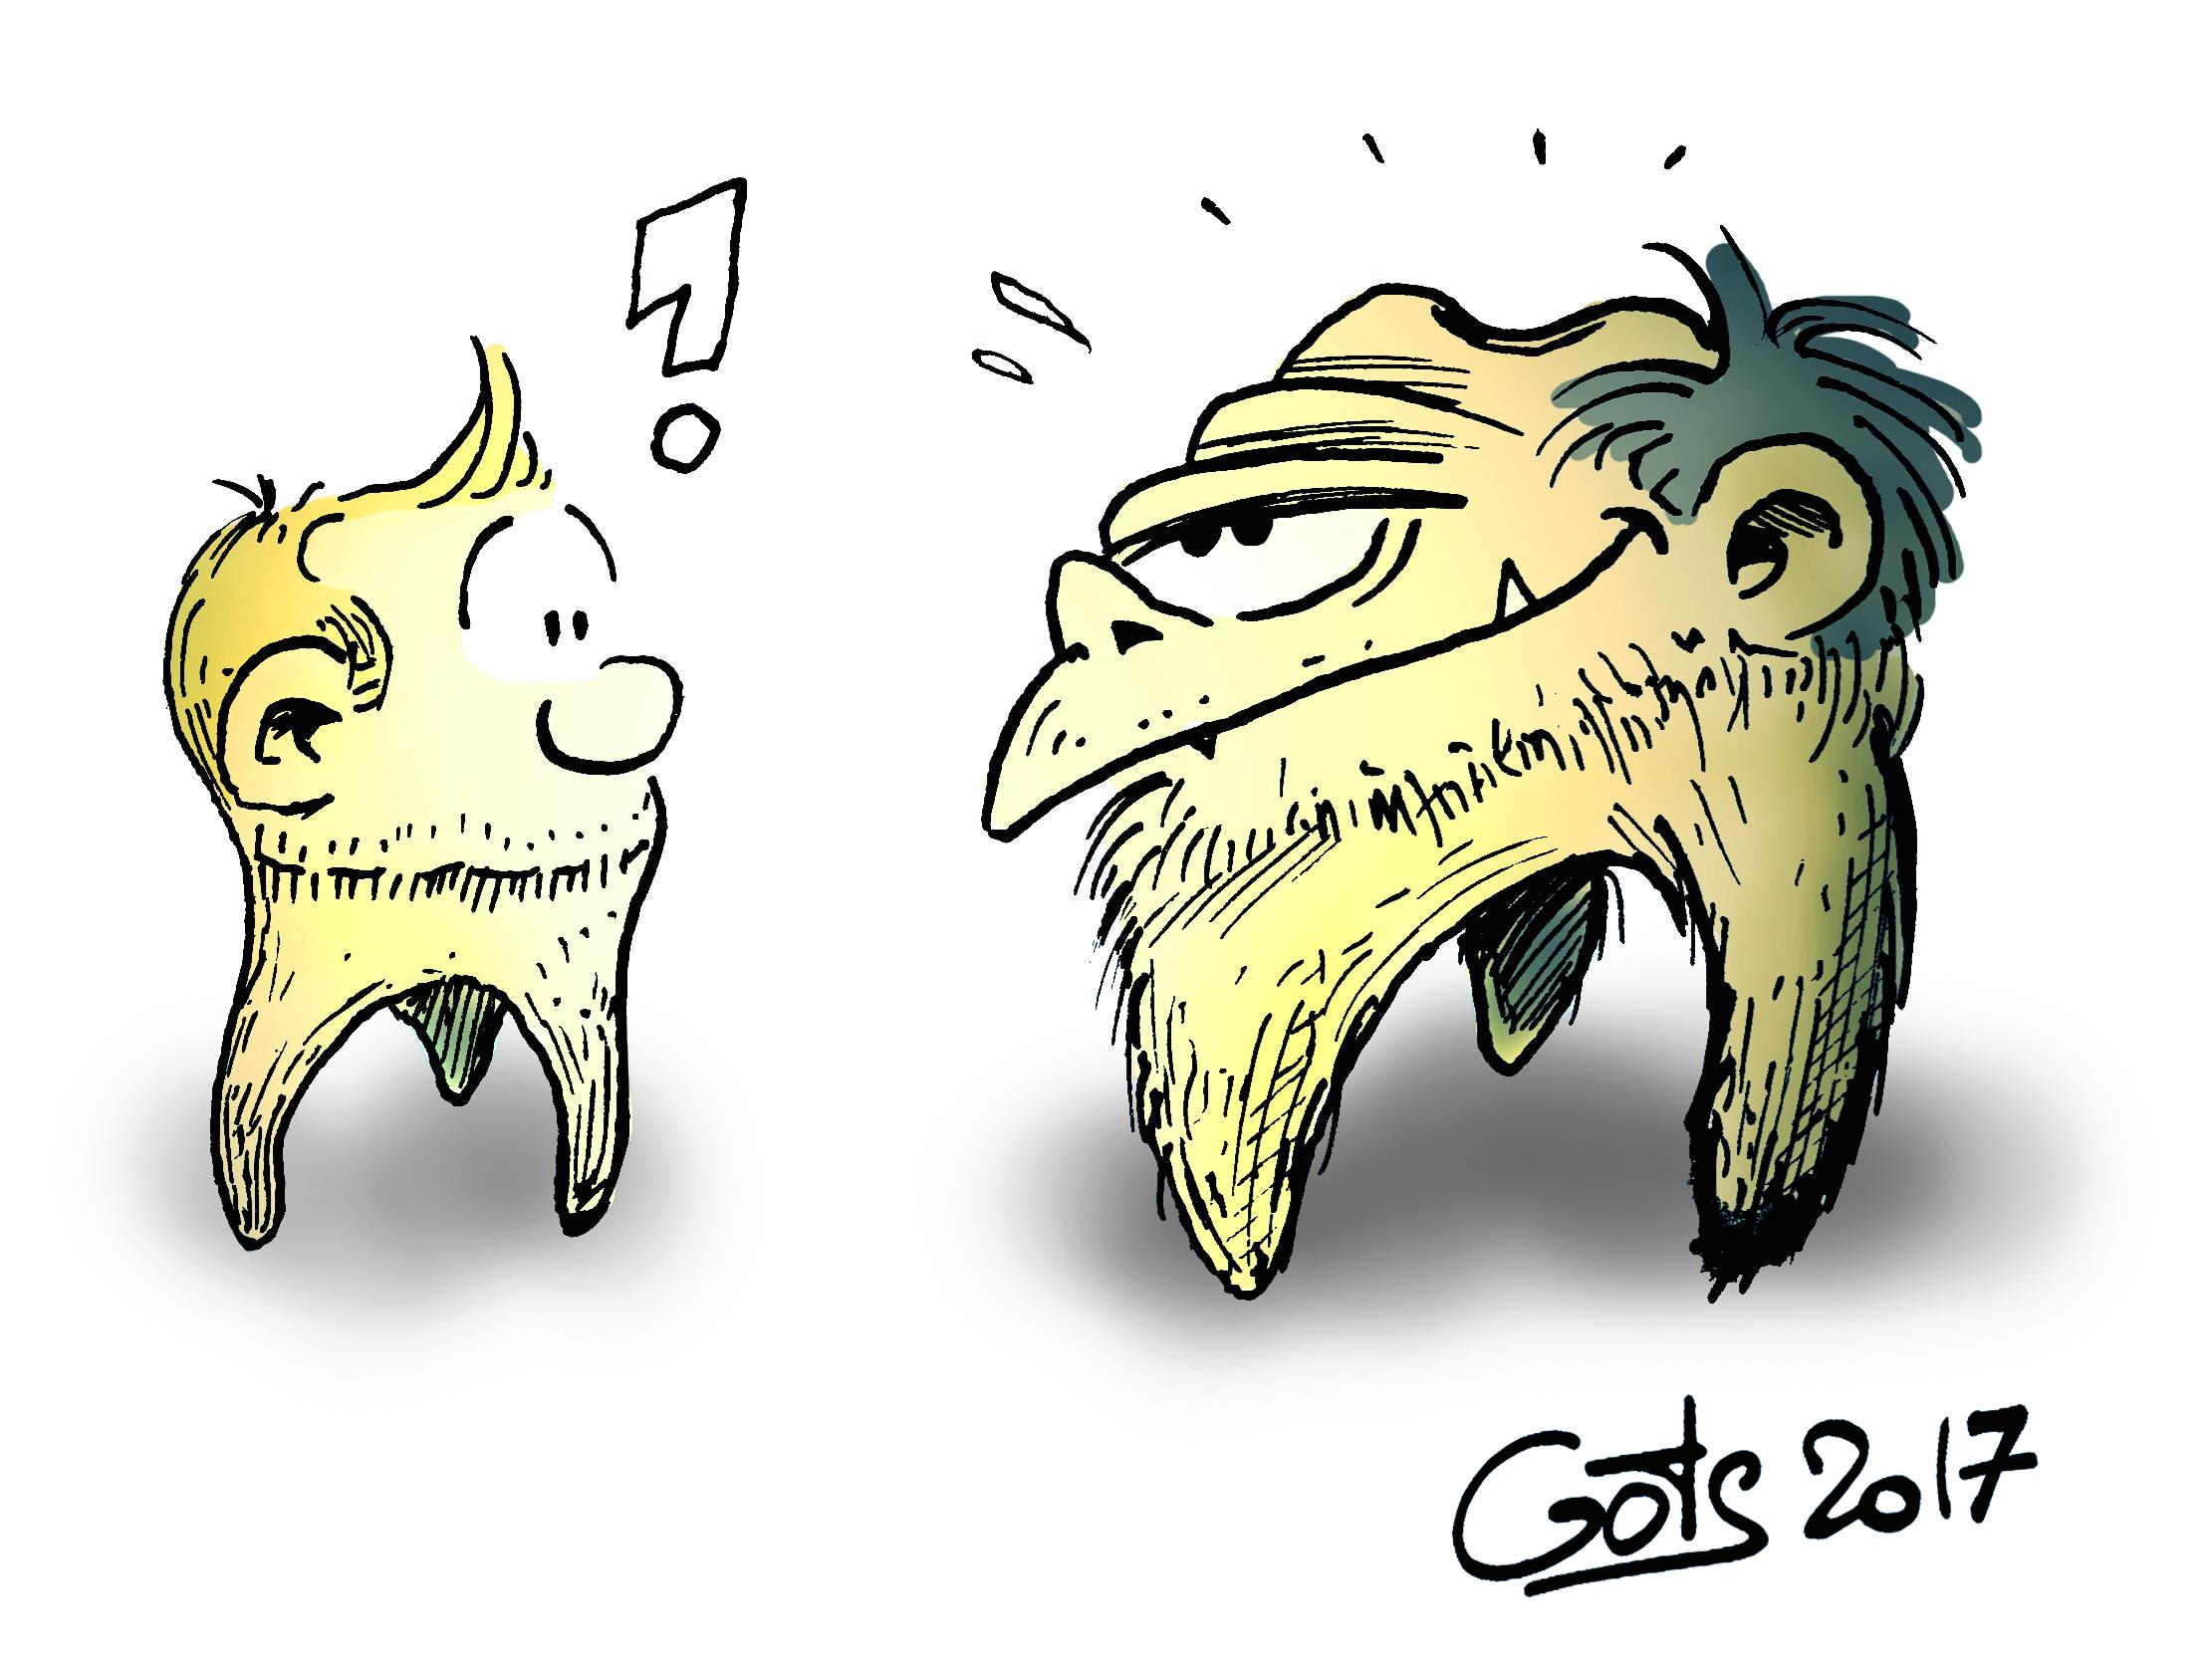 Molaires sapiens vs neand